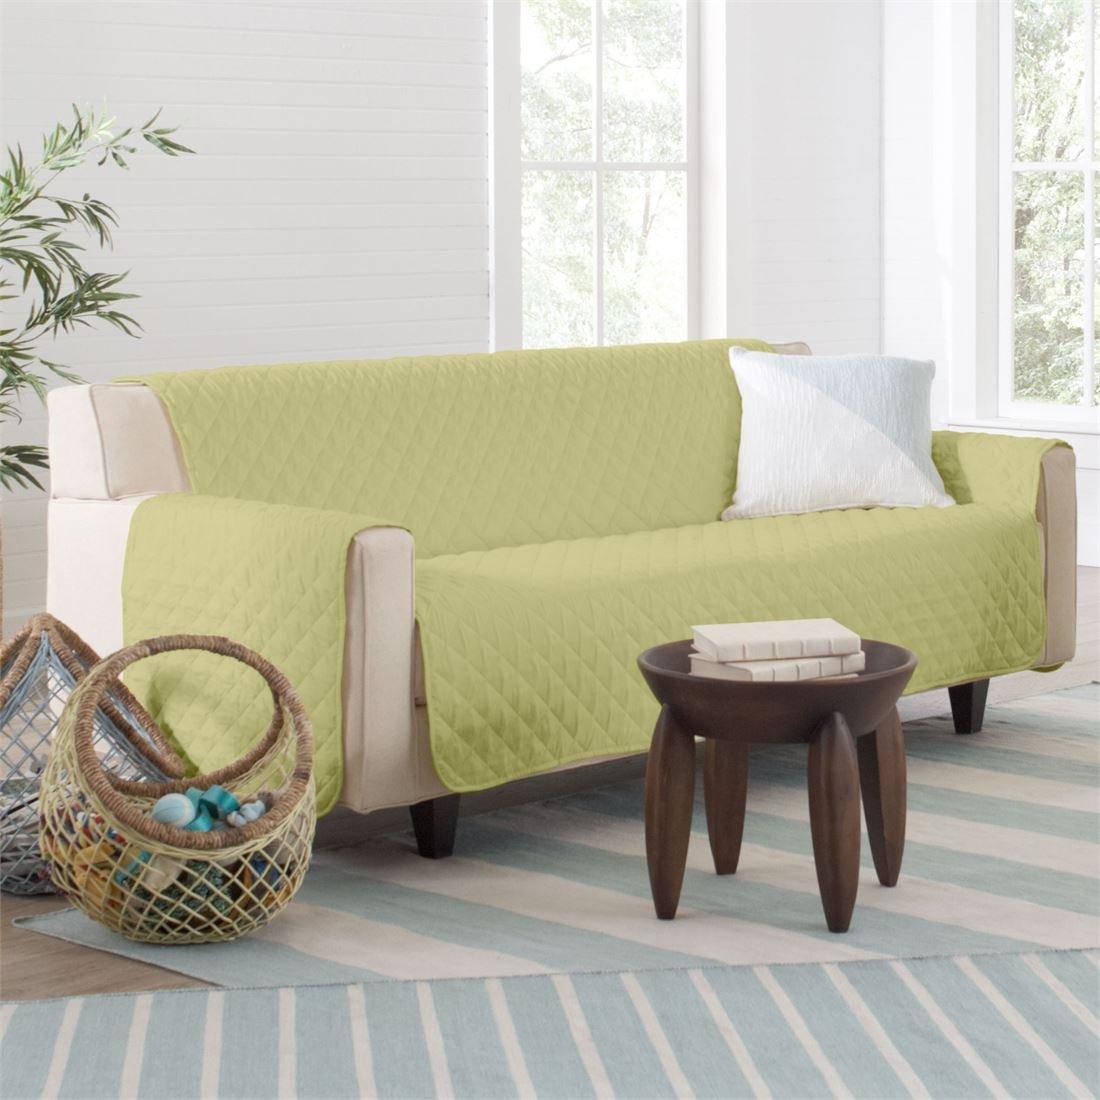 BrylaneHome Bh Studio Water-Repellent Microfiber Sofa Protector (Pear,0)